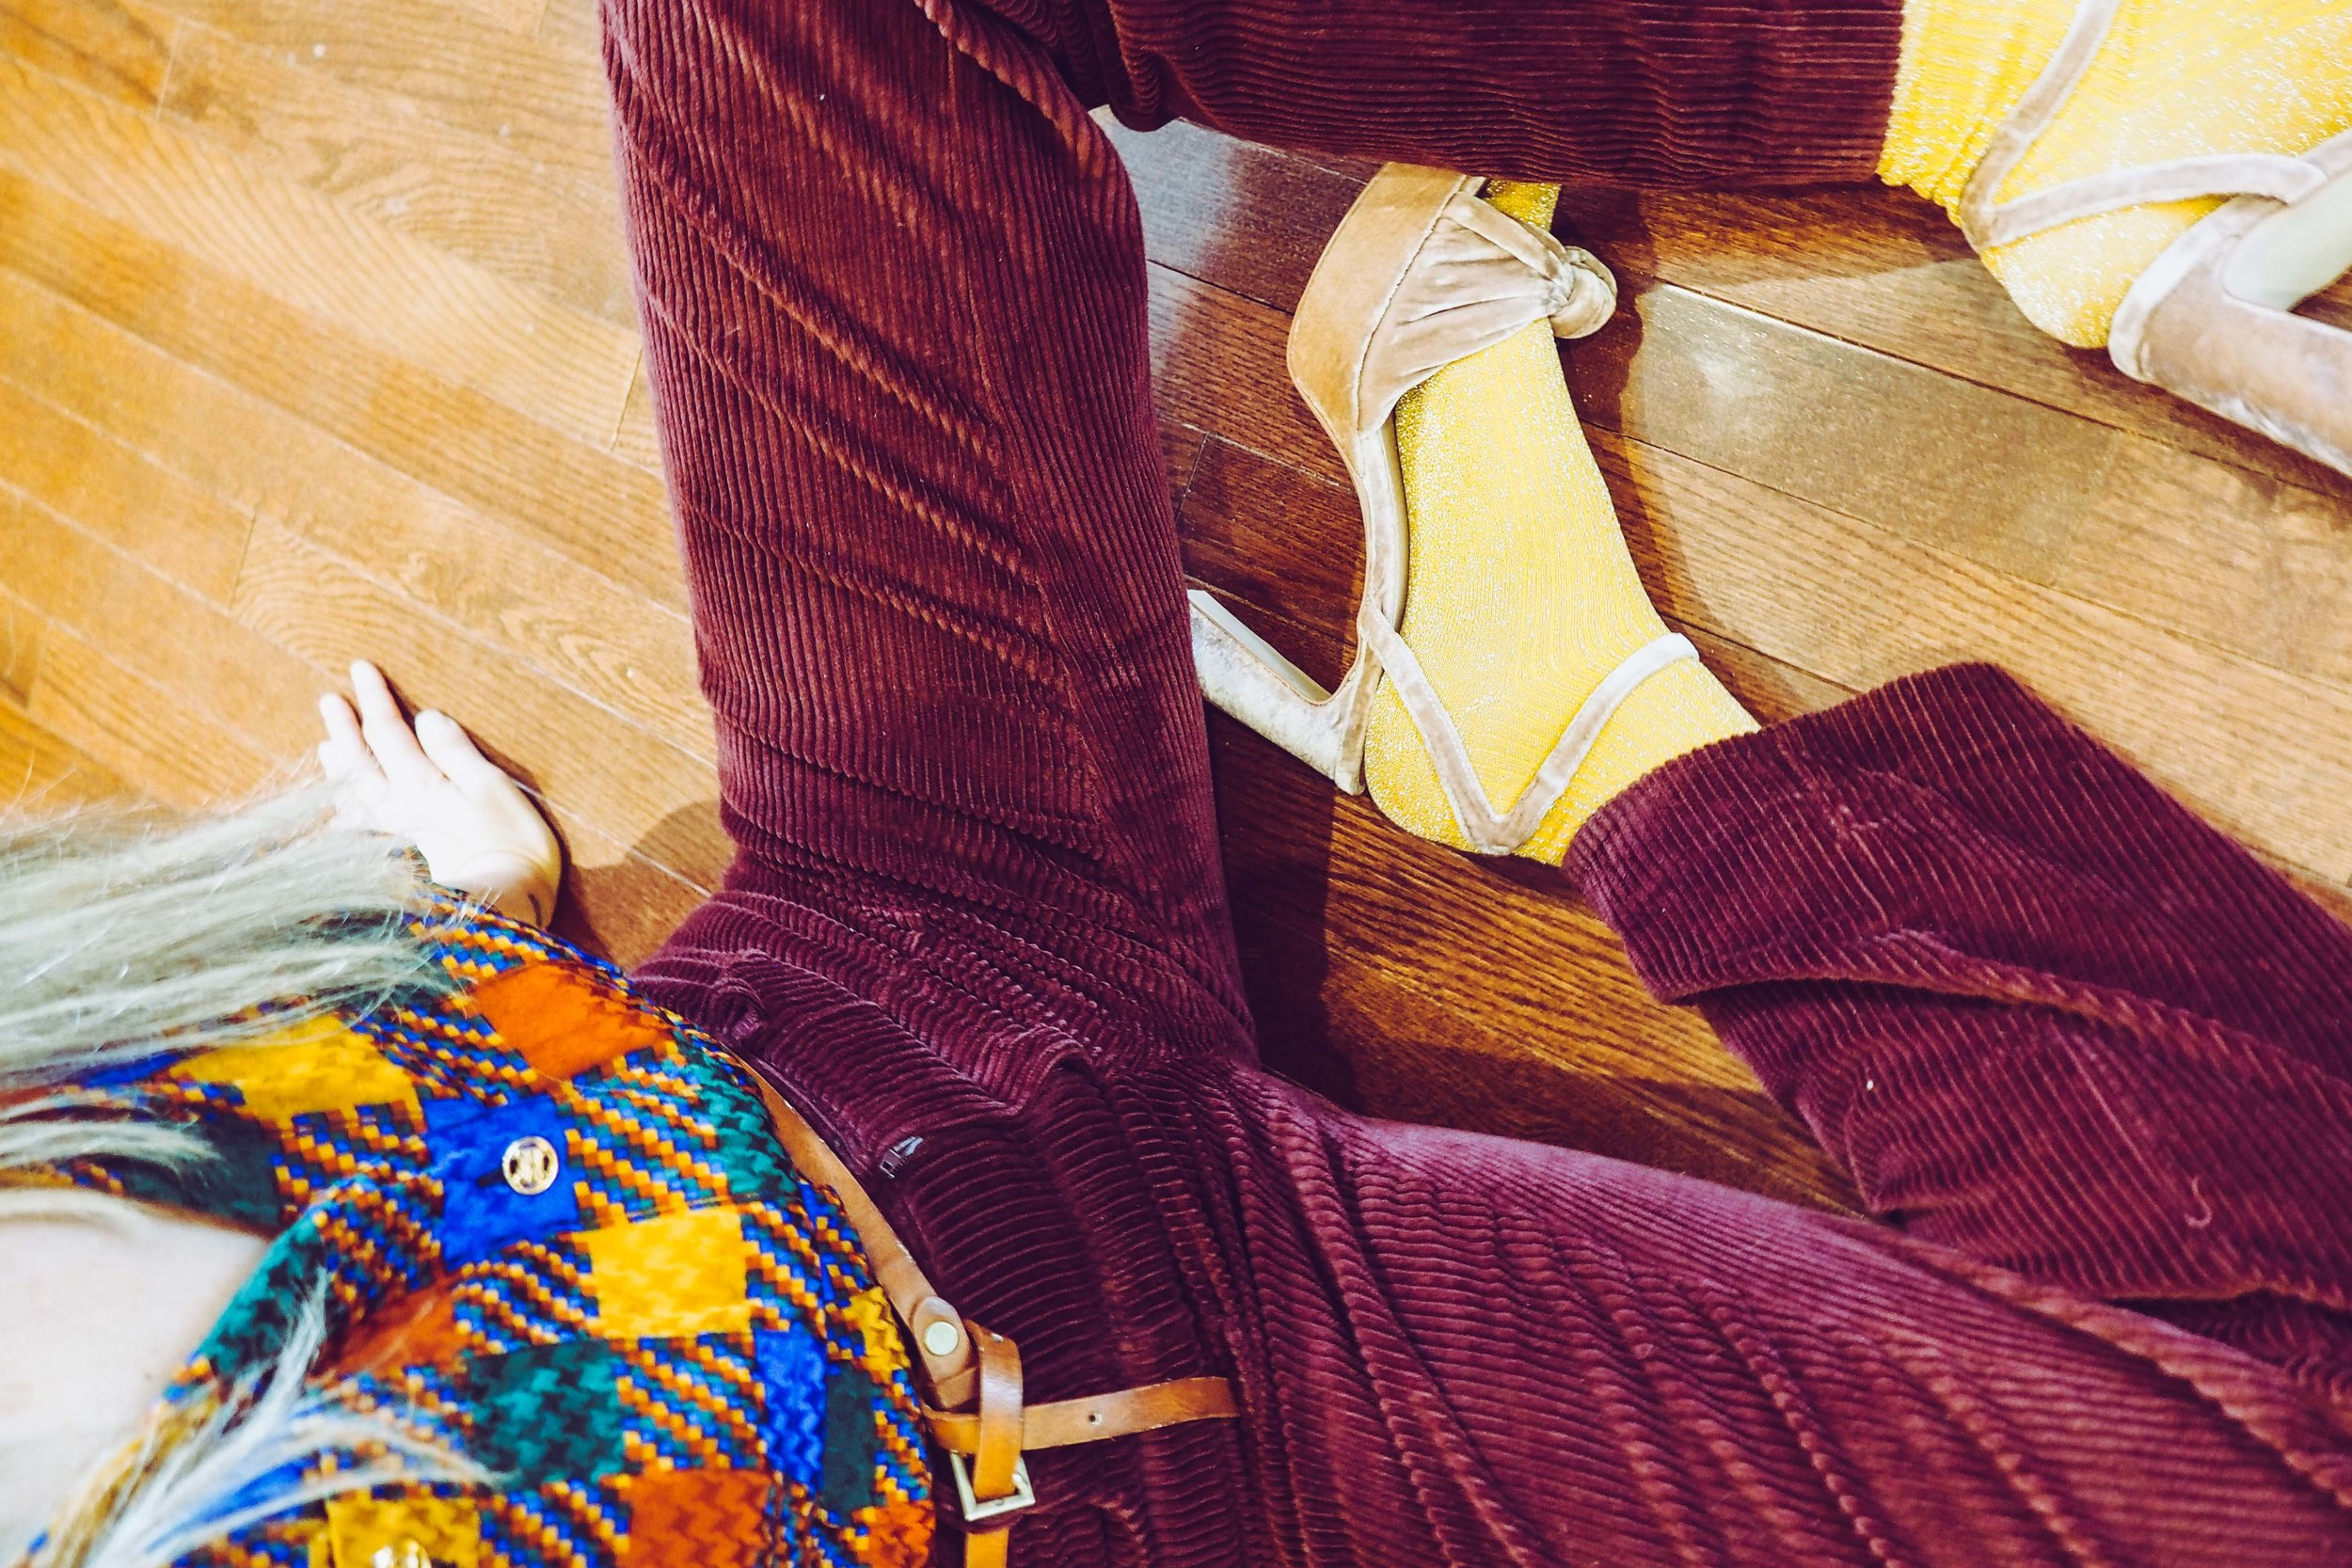 Blouse vintage Celine, shoes H&M, cords Zara, socks TopShop